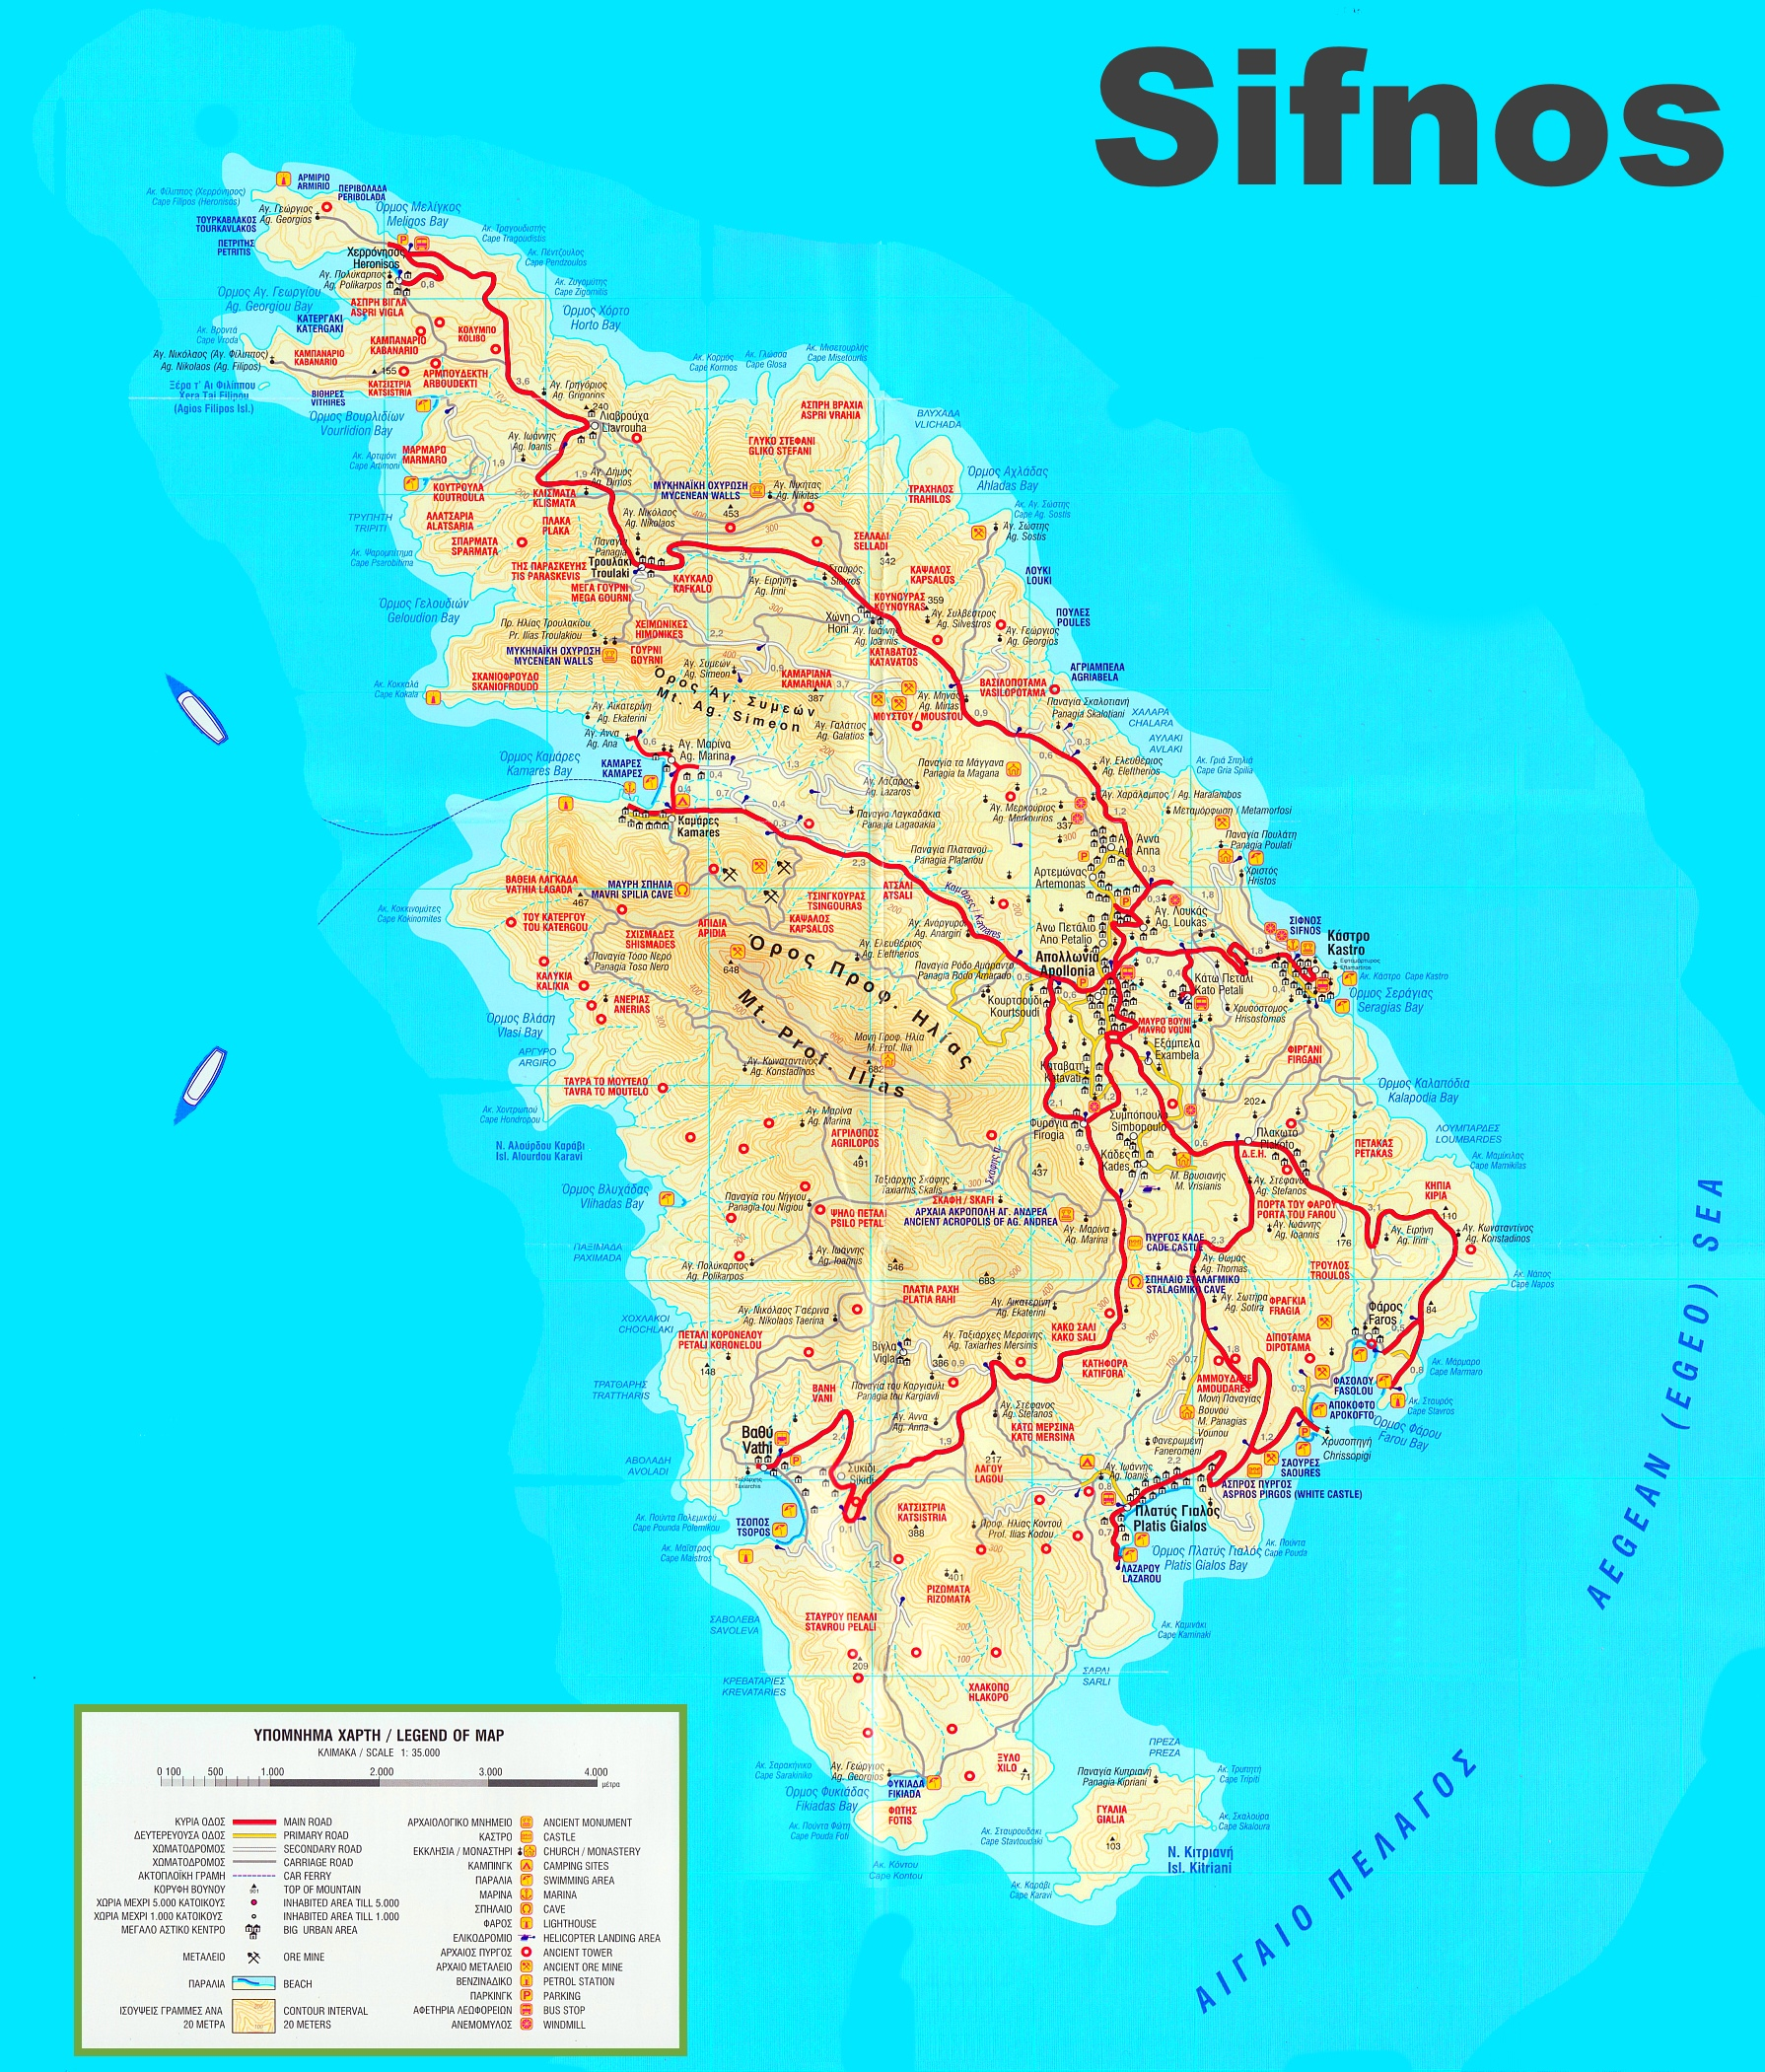 Sifnos Maps Greece Maps of Sifnos Island